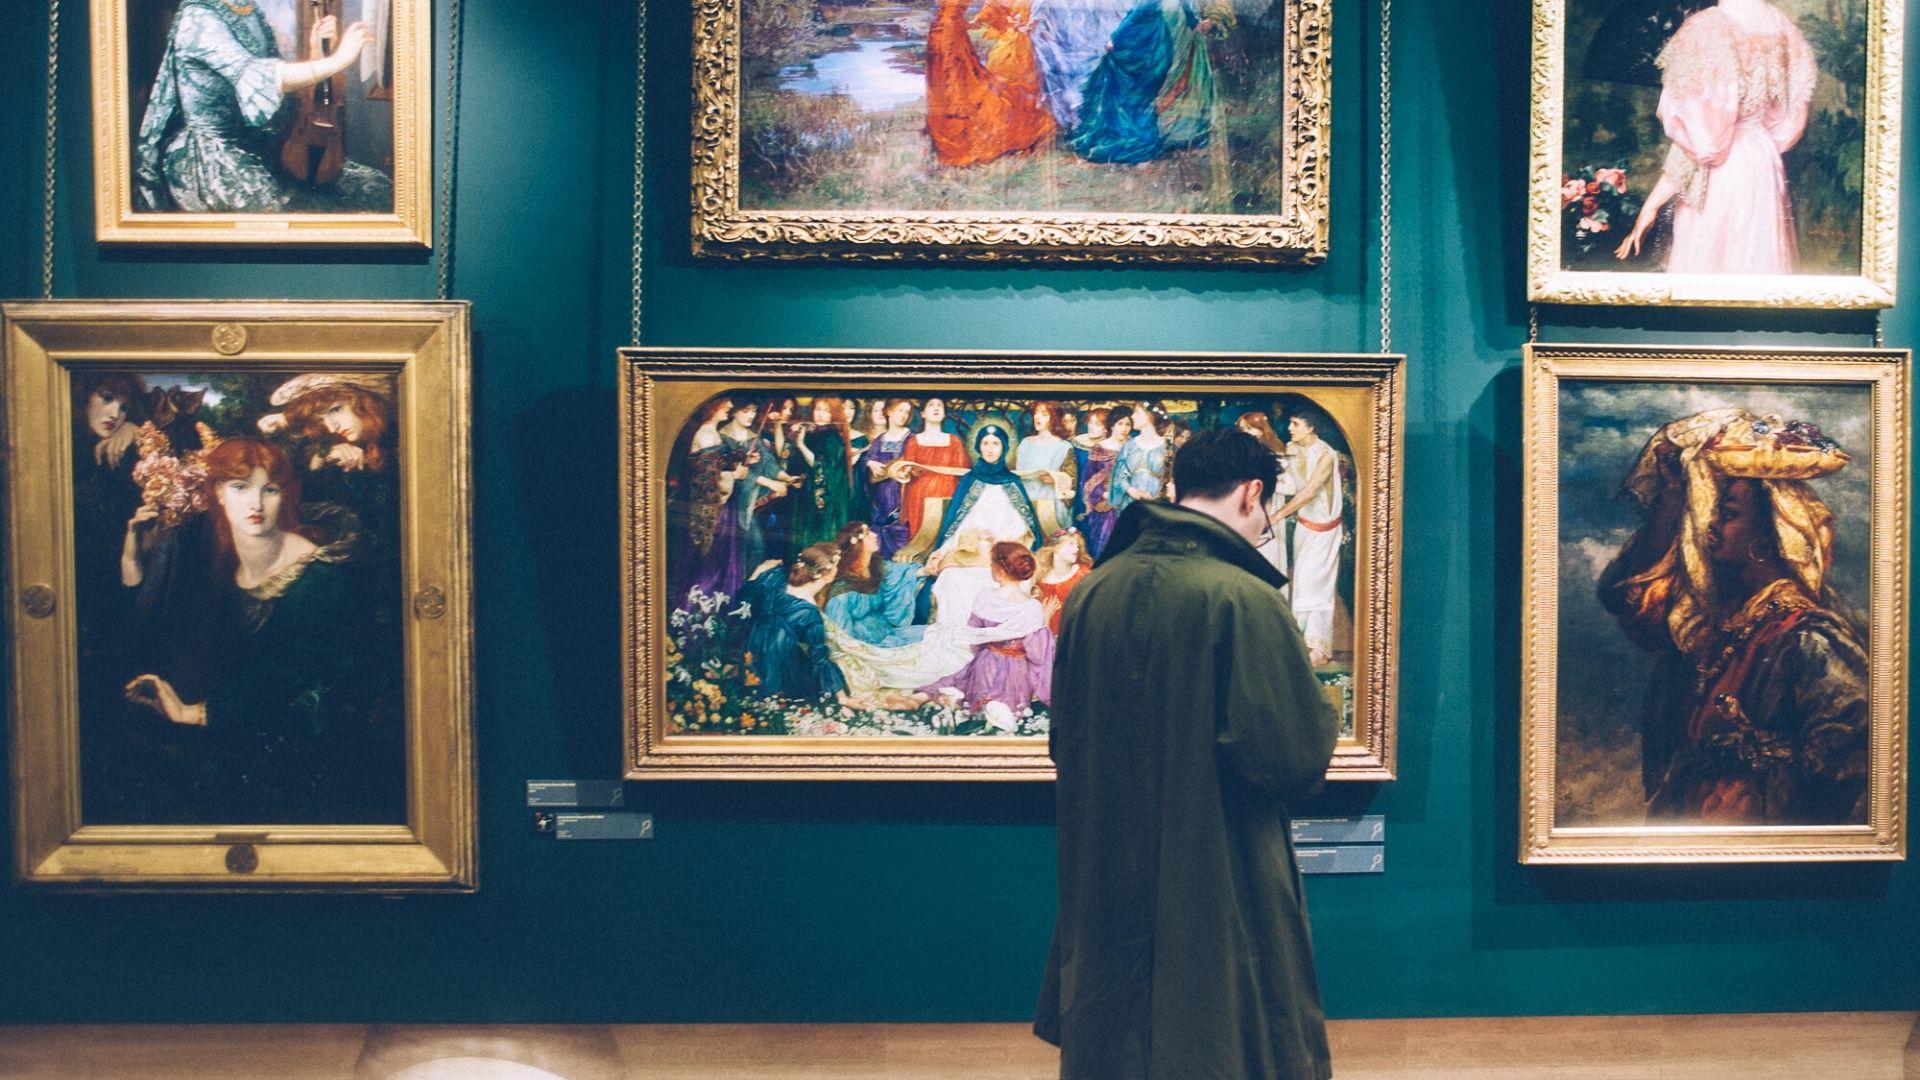 Image of Virtual Museum Exhibits